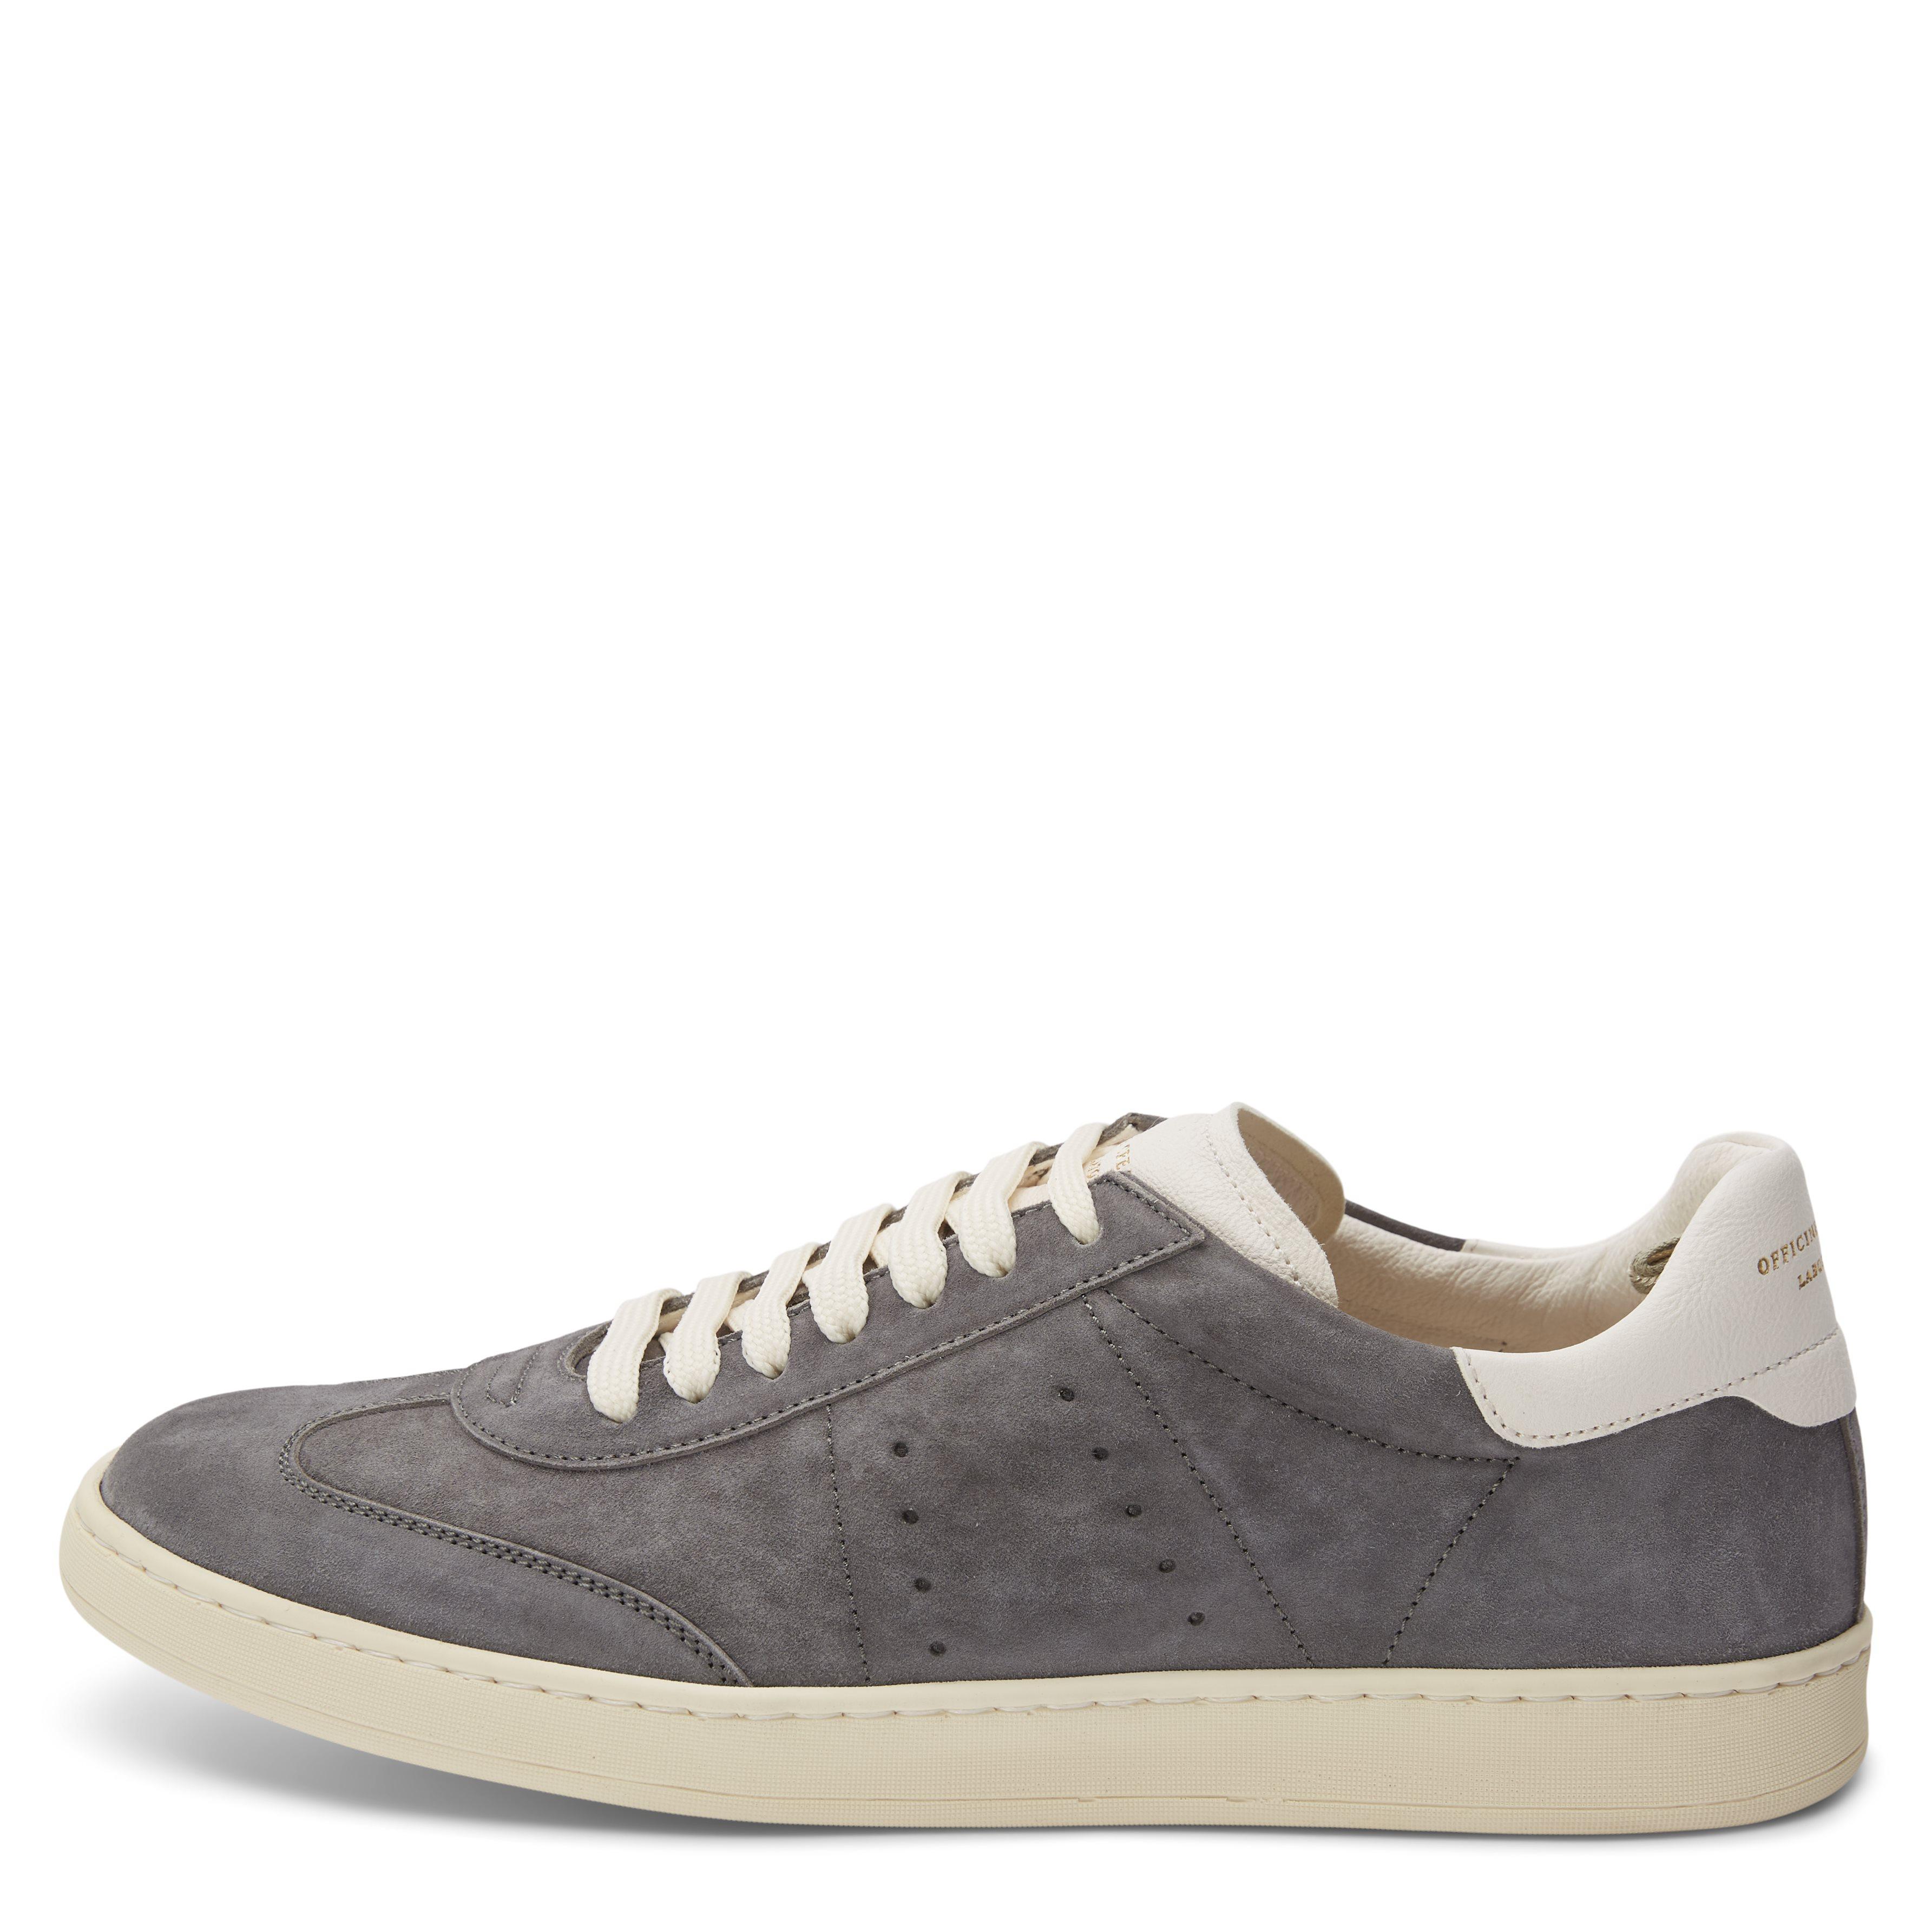 Kombo Sneakers - Sko - Grå